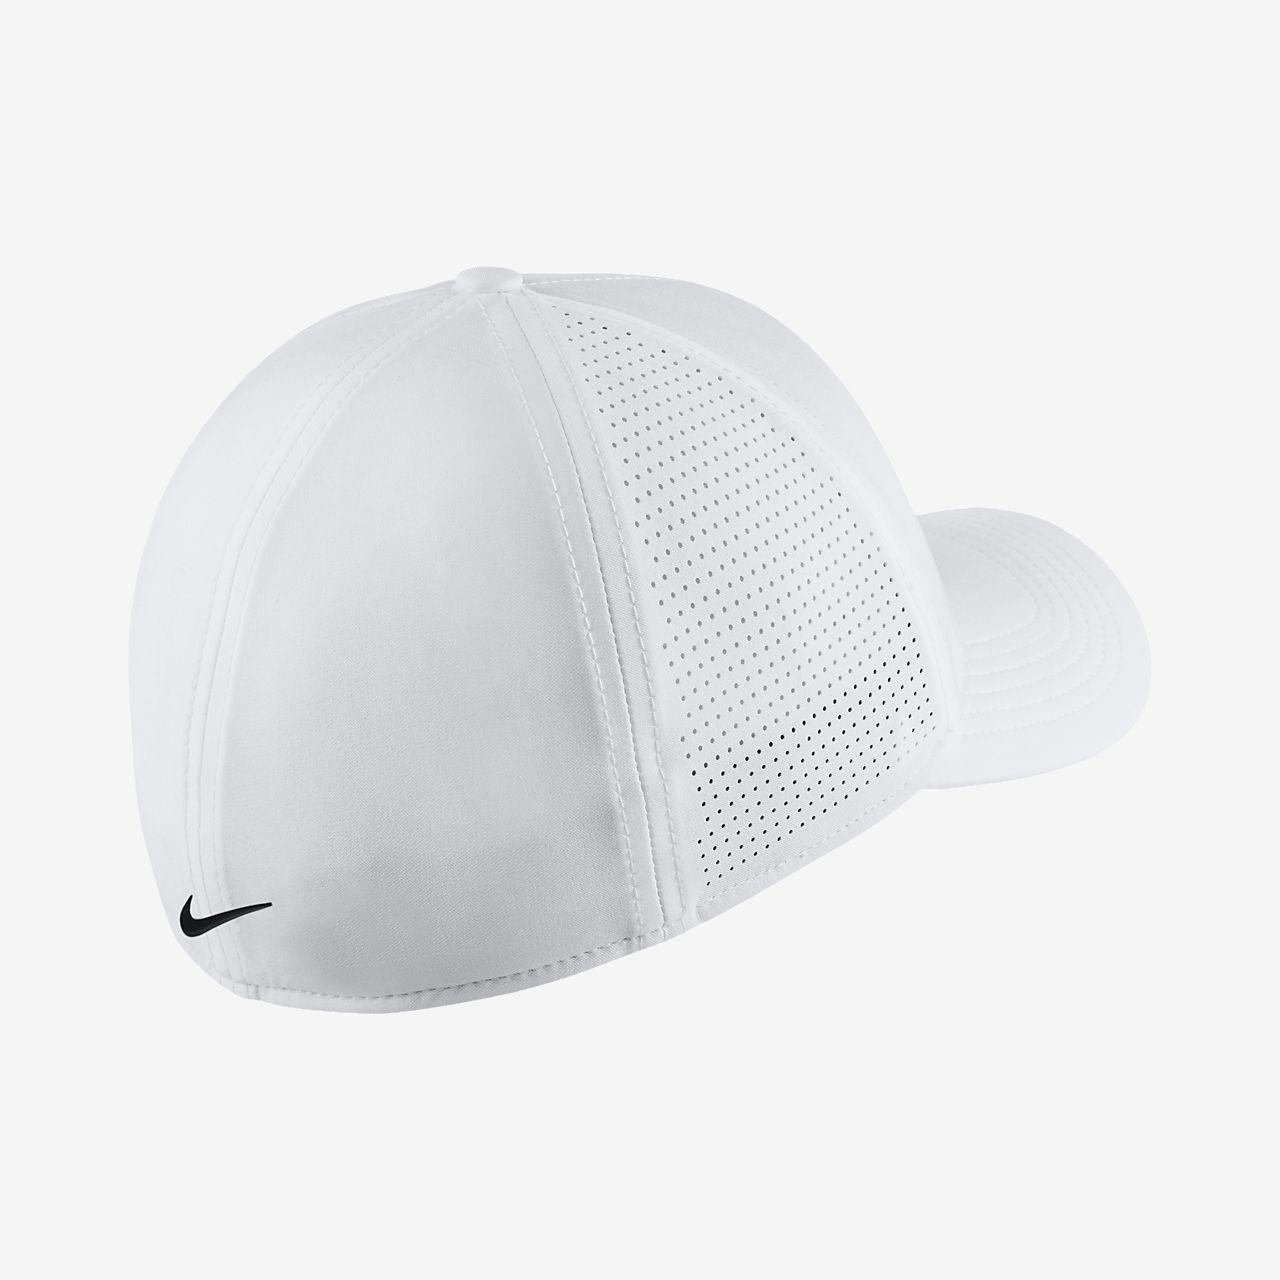 f67deac5665 Nike AeroBill Classic 99 Fitted Golf Hat. Nike.com